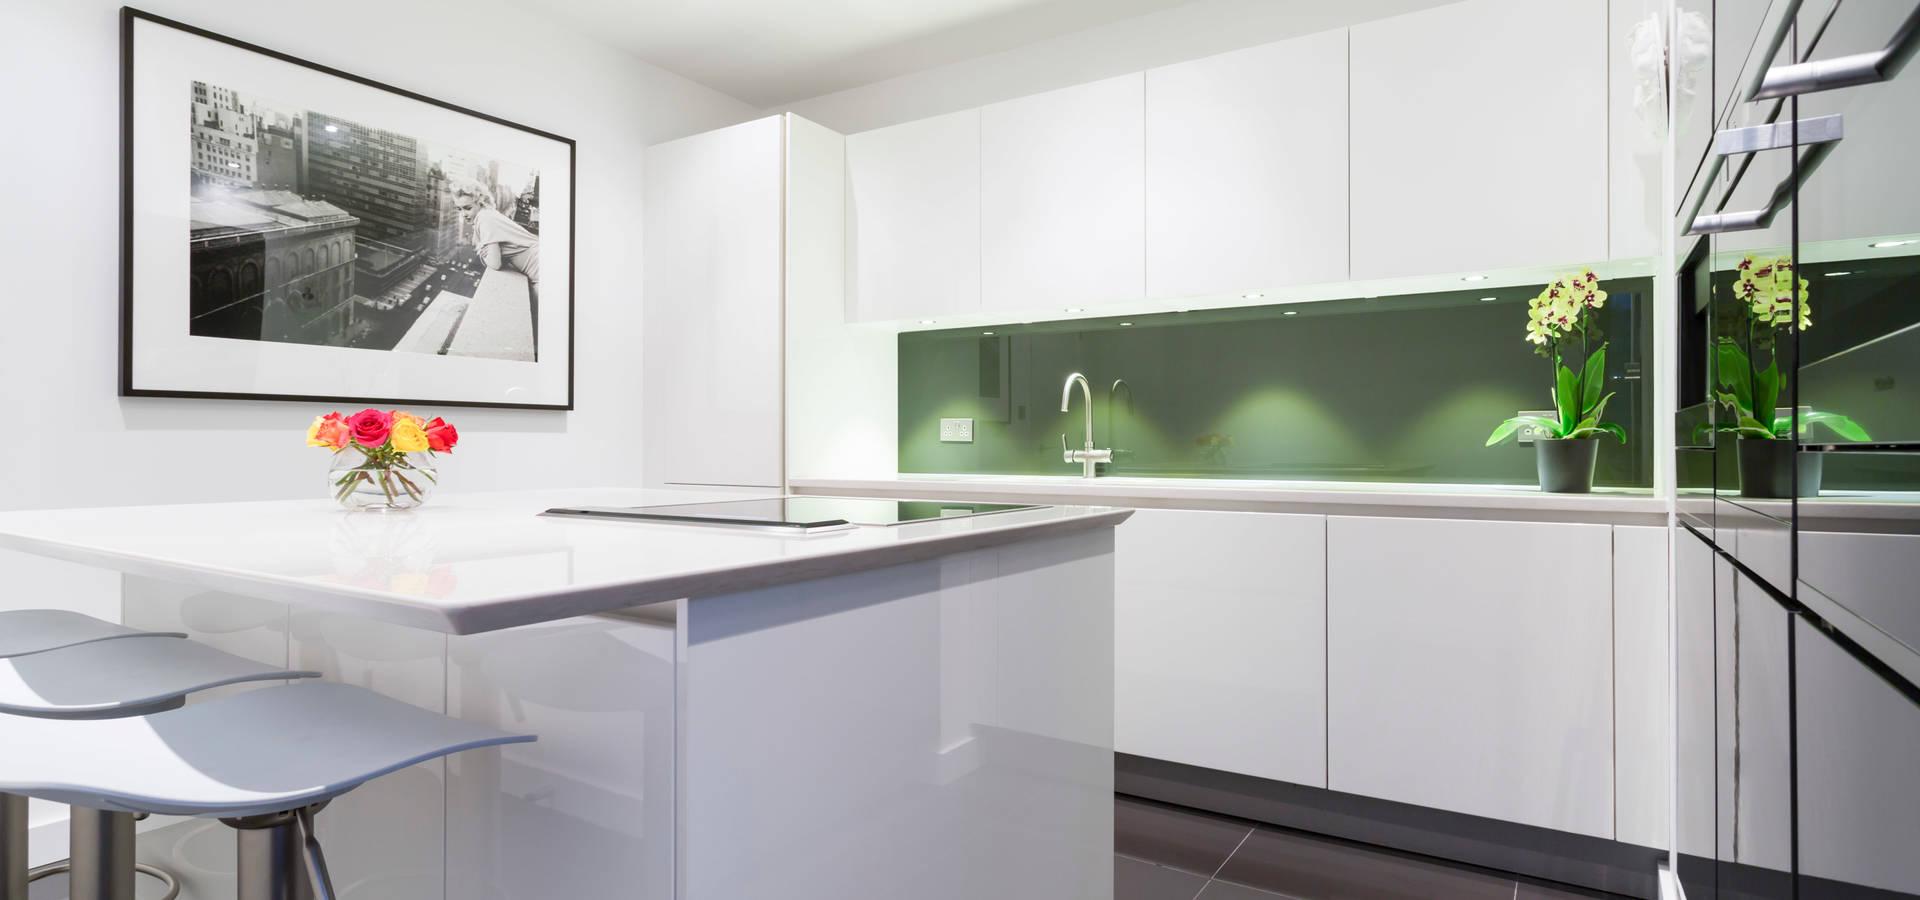 LWK London Kitchens